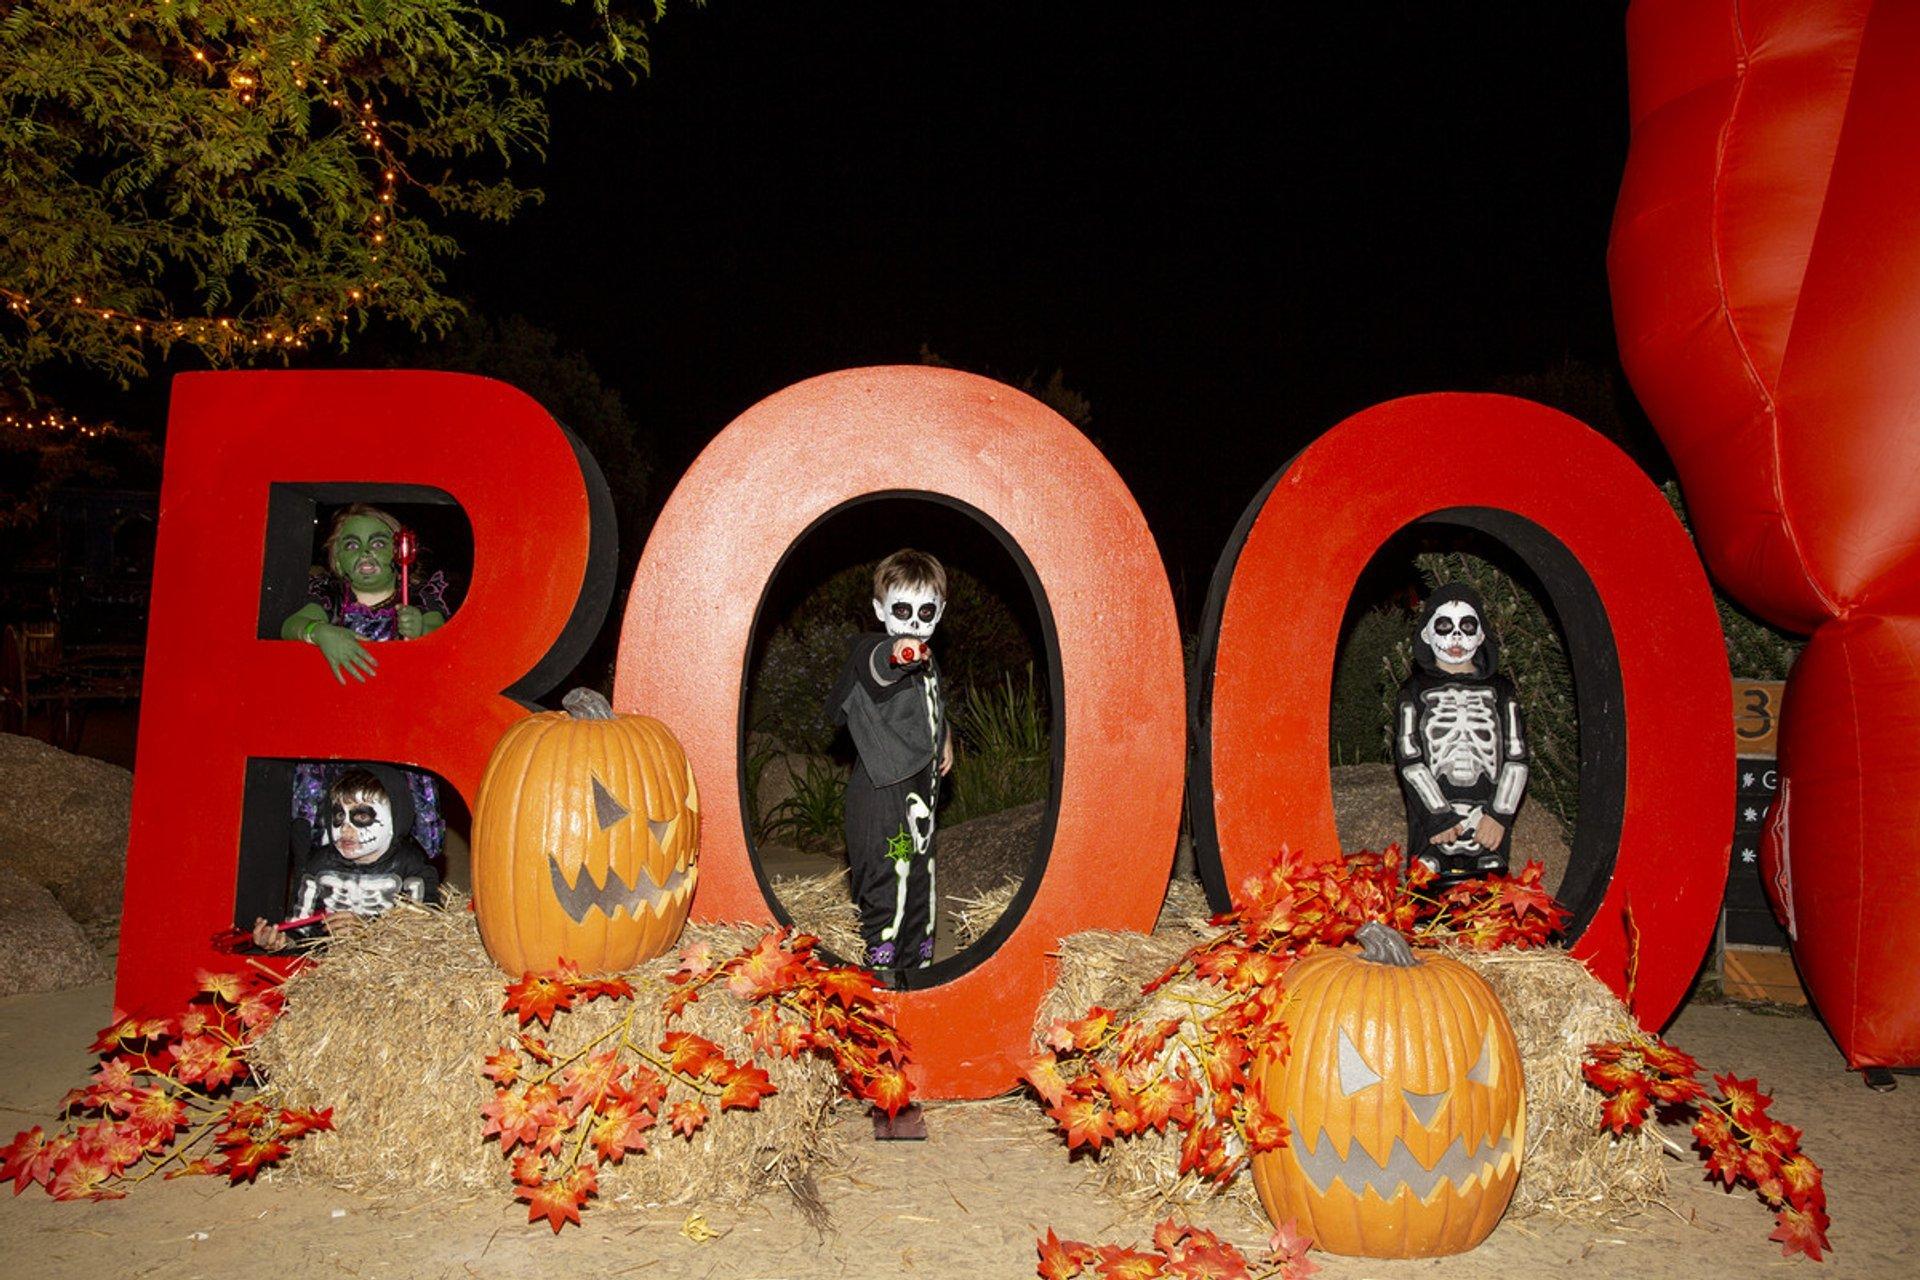 Boo at the Zoo - Werribee Open Range Zoo 2020